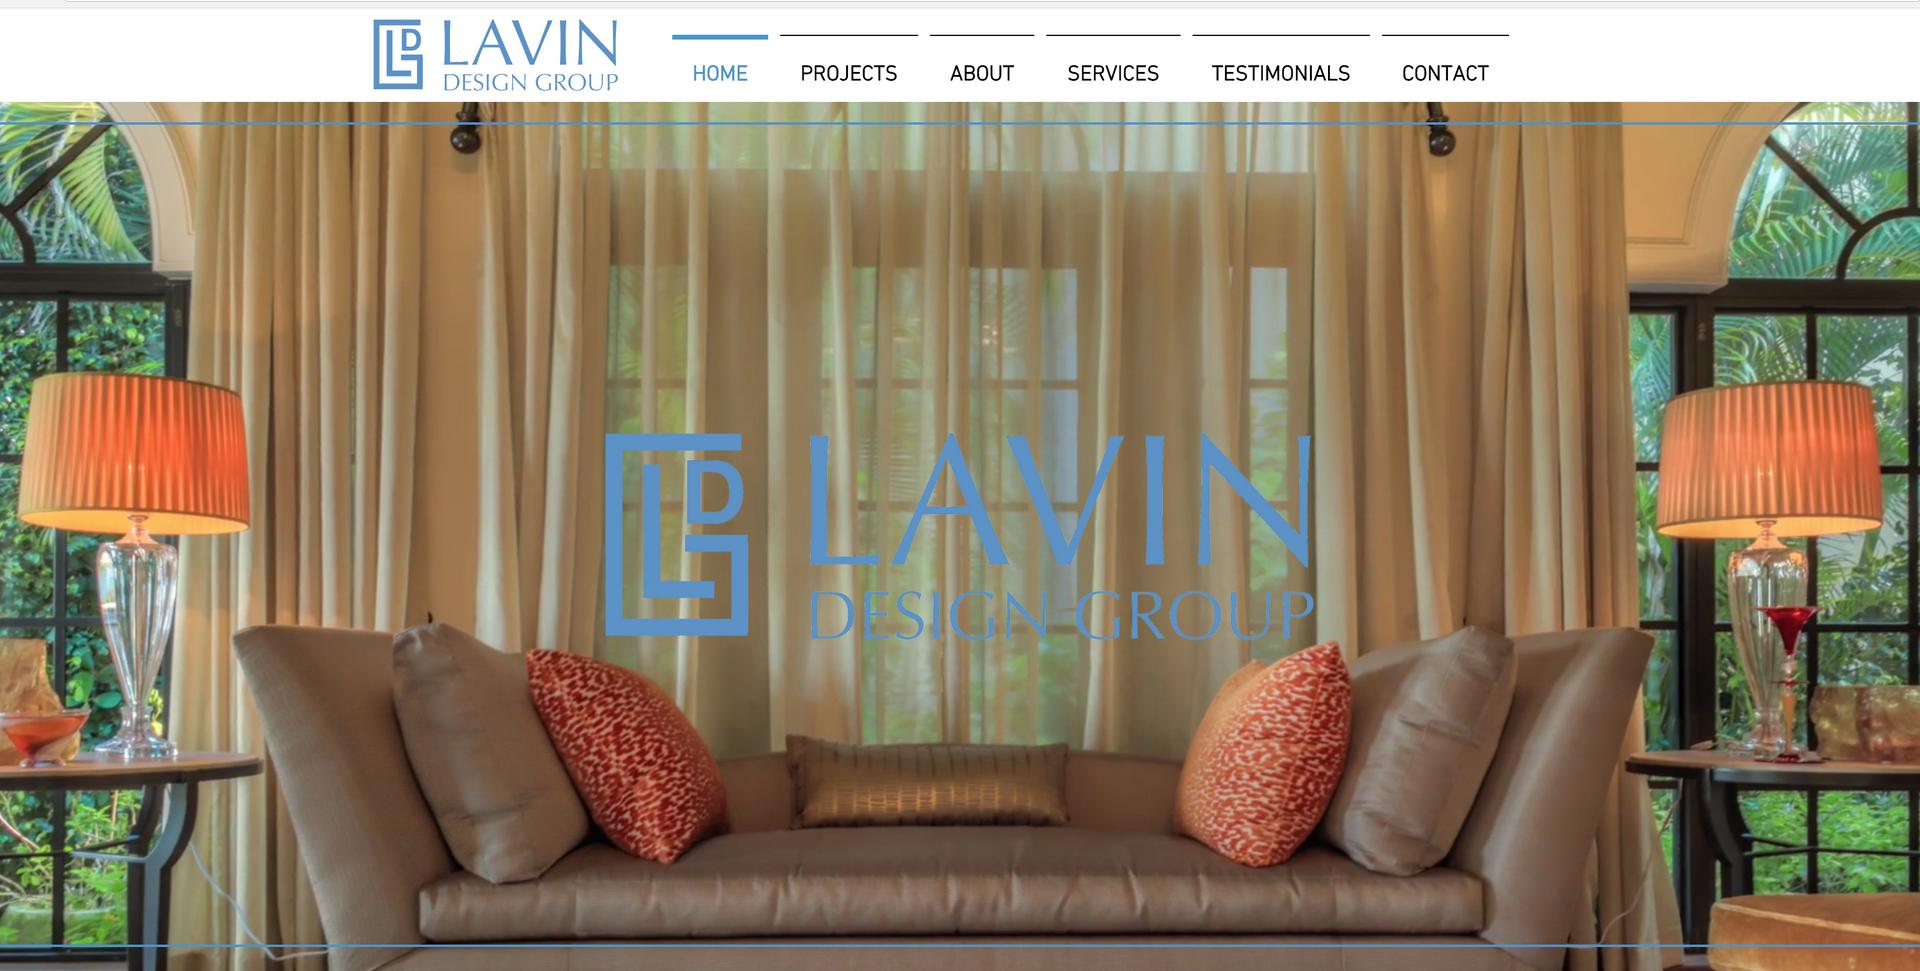 Lavin Design Group